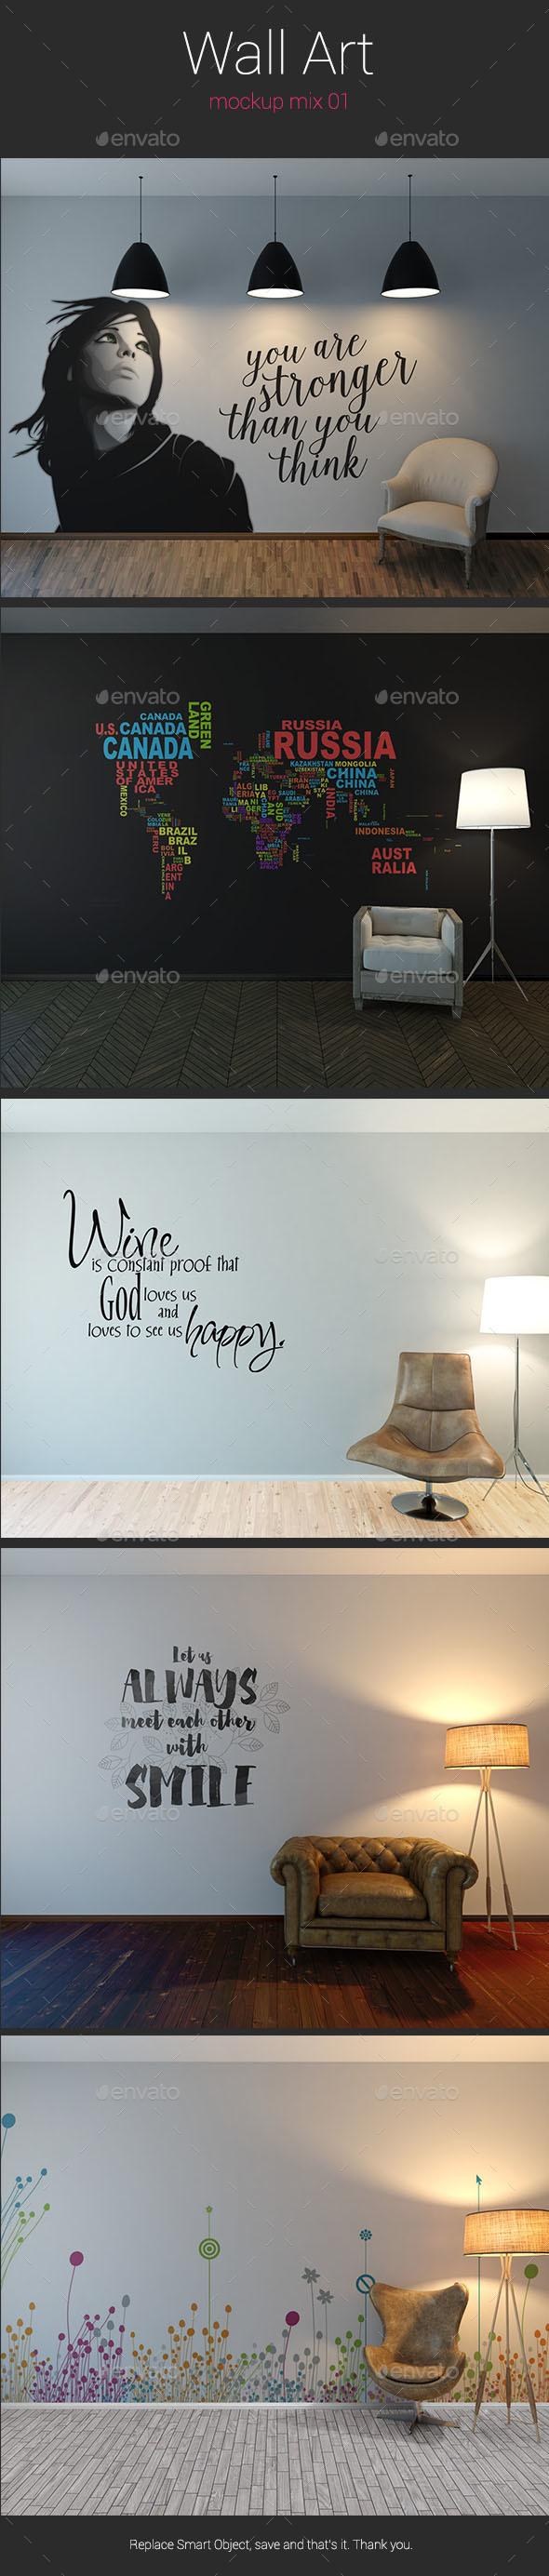 Wall Art Mockup